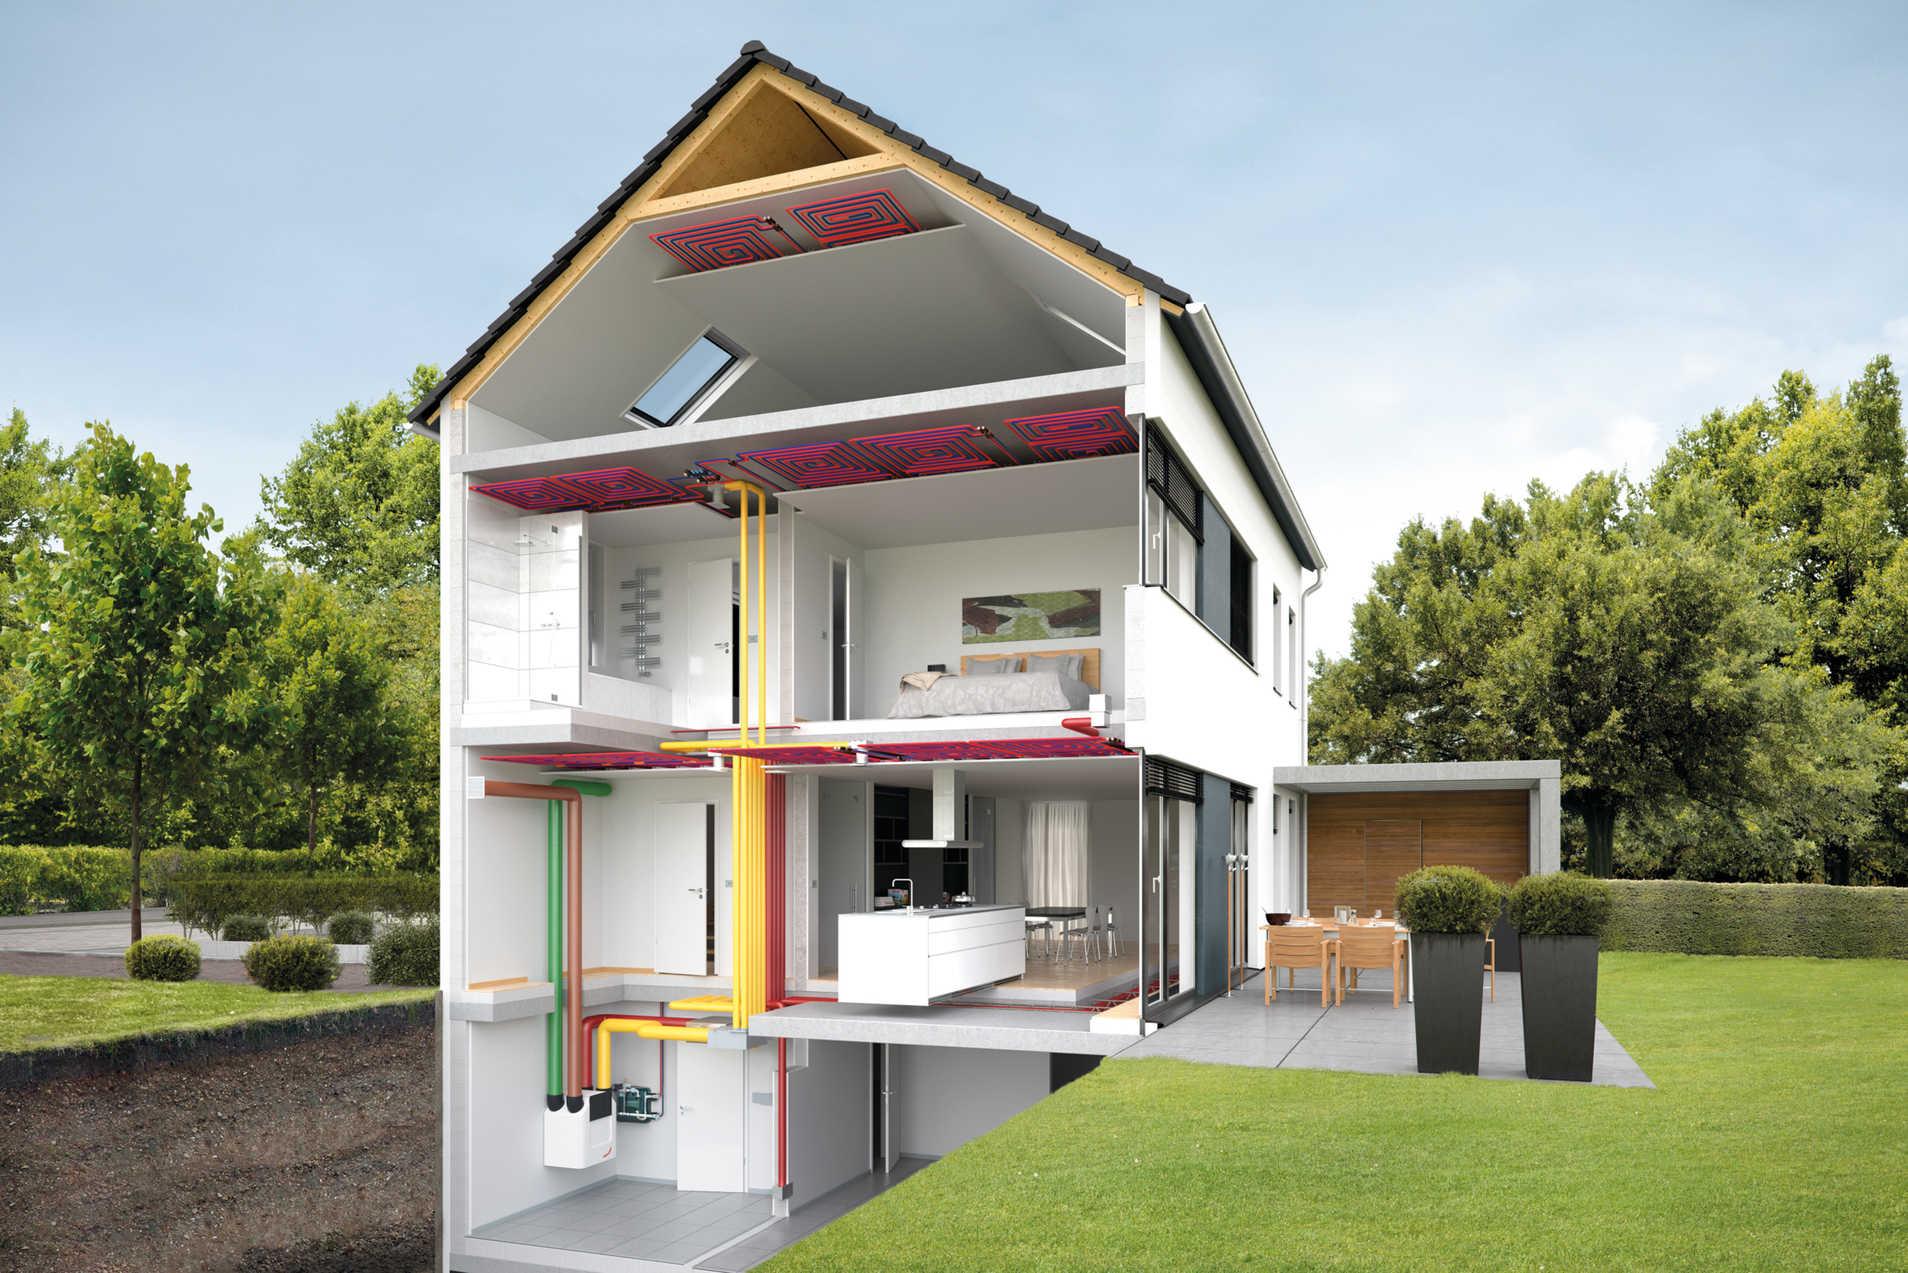 Ventilazione comfort per spazi abitativi zehnder group - Sistemi per riscaldare casa ...